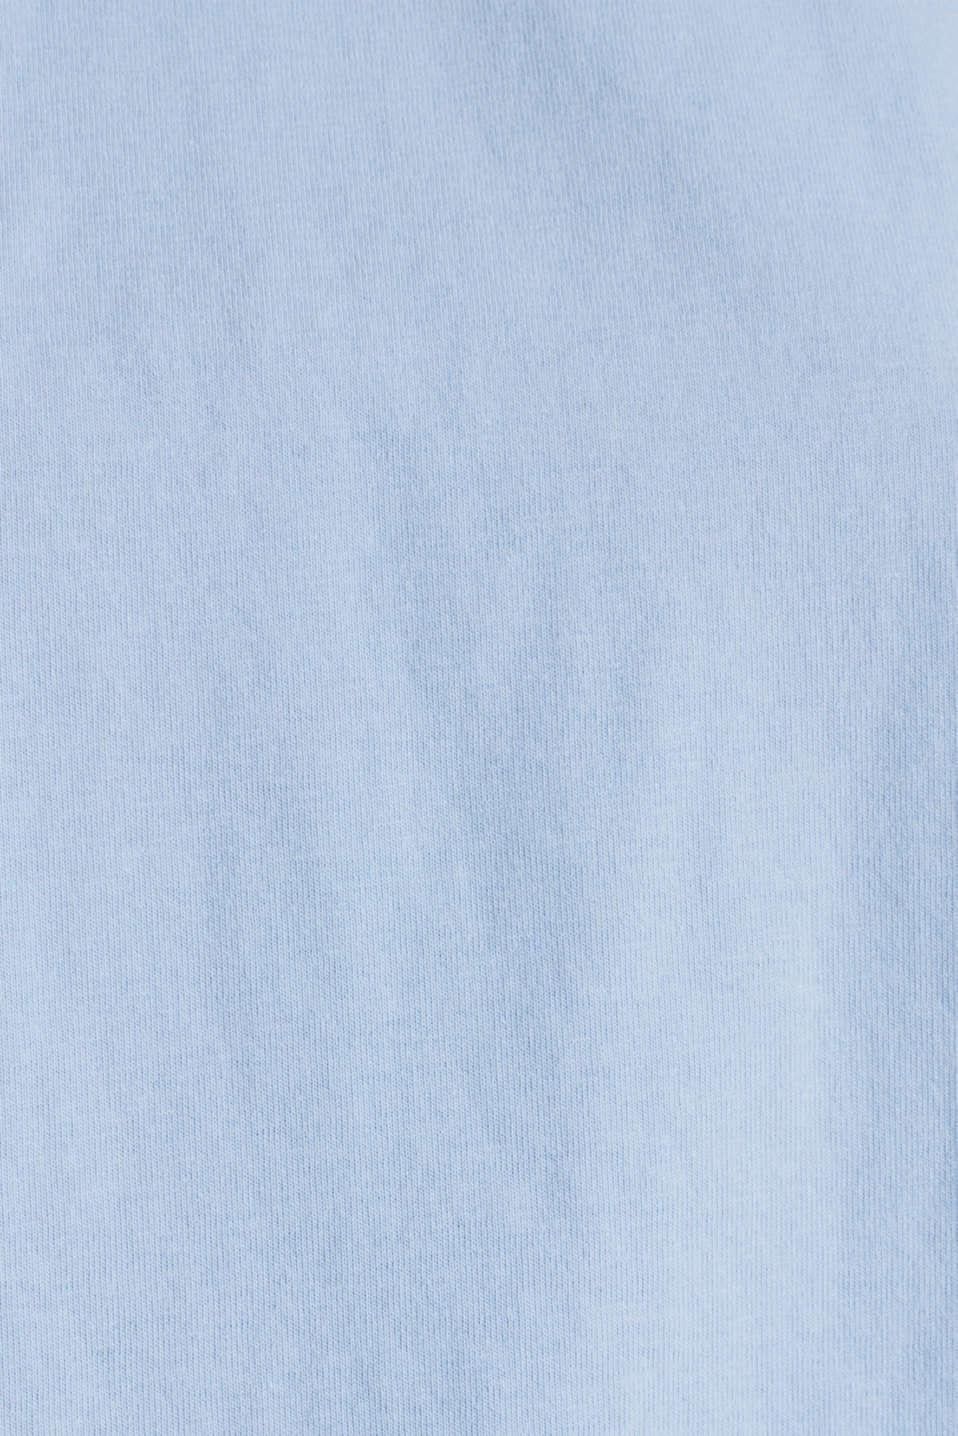 Loose T-shirt in 100% cotton, BLUE LAVENDER 4, detail image number 4